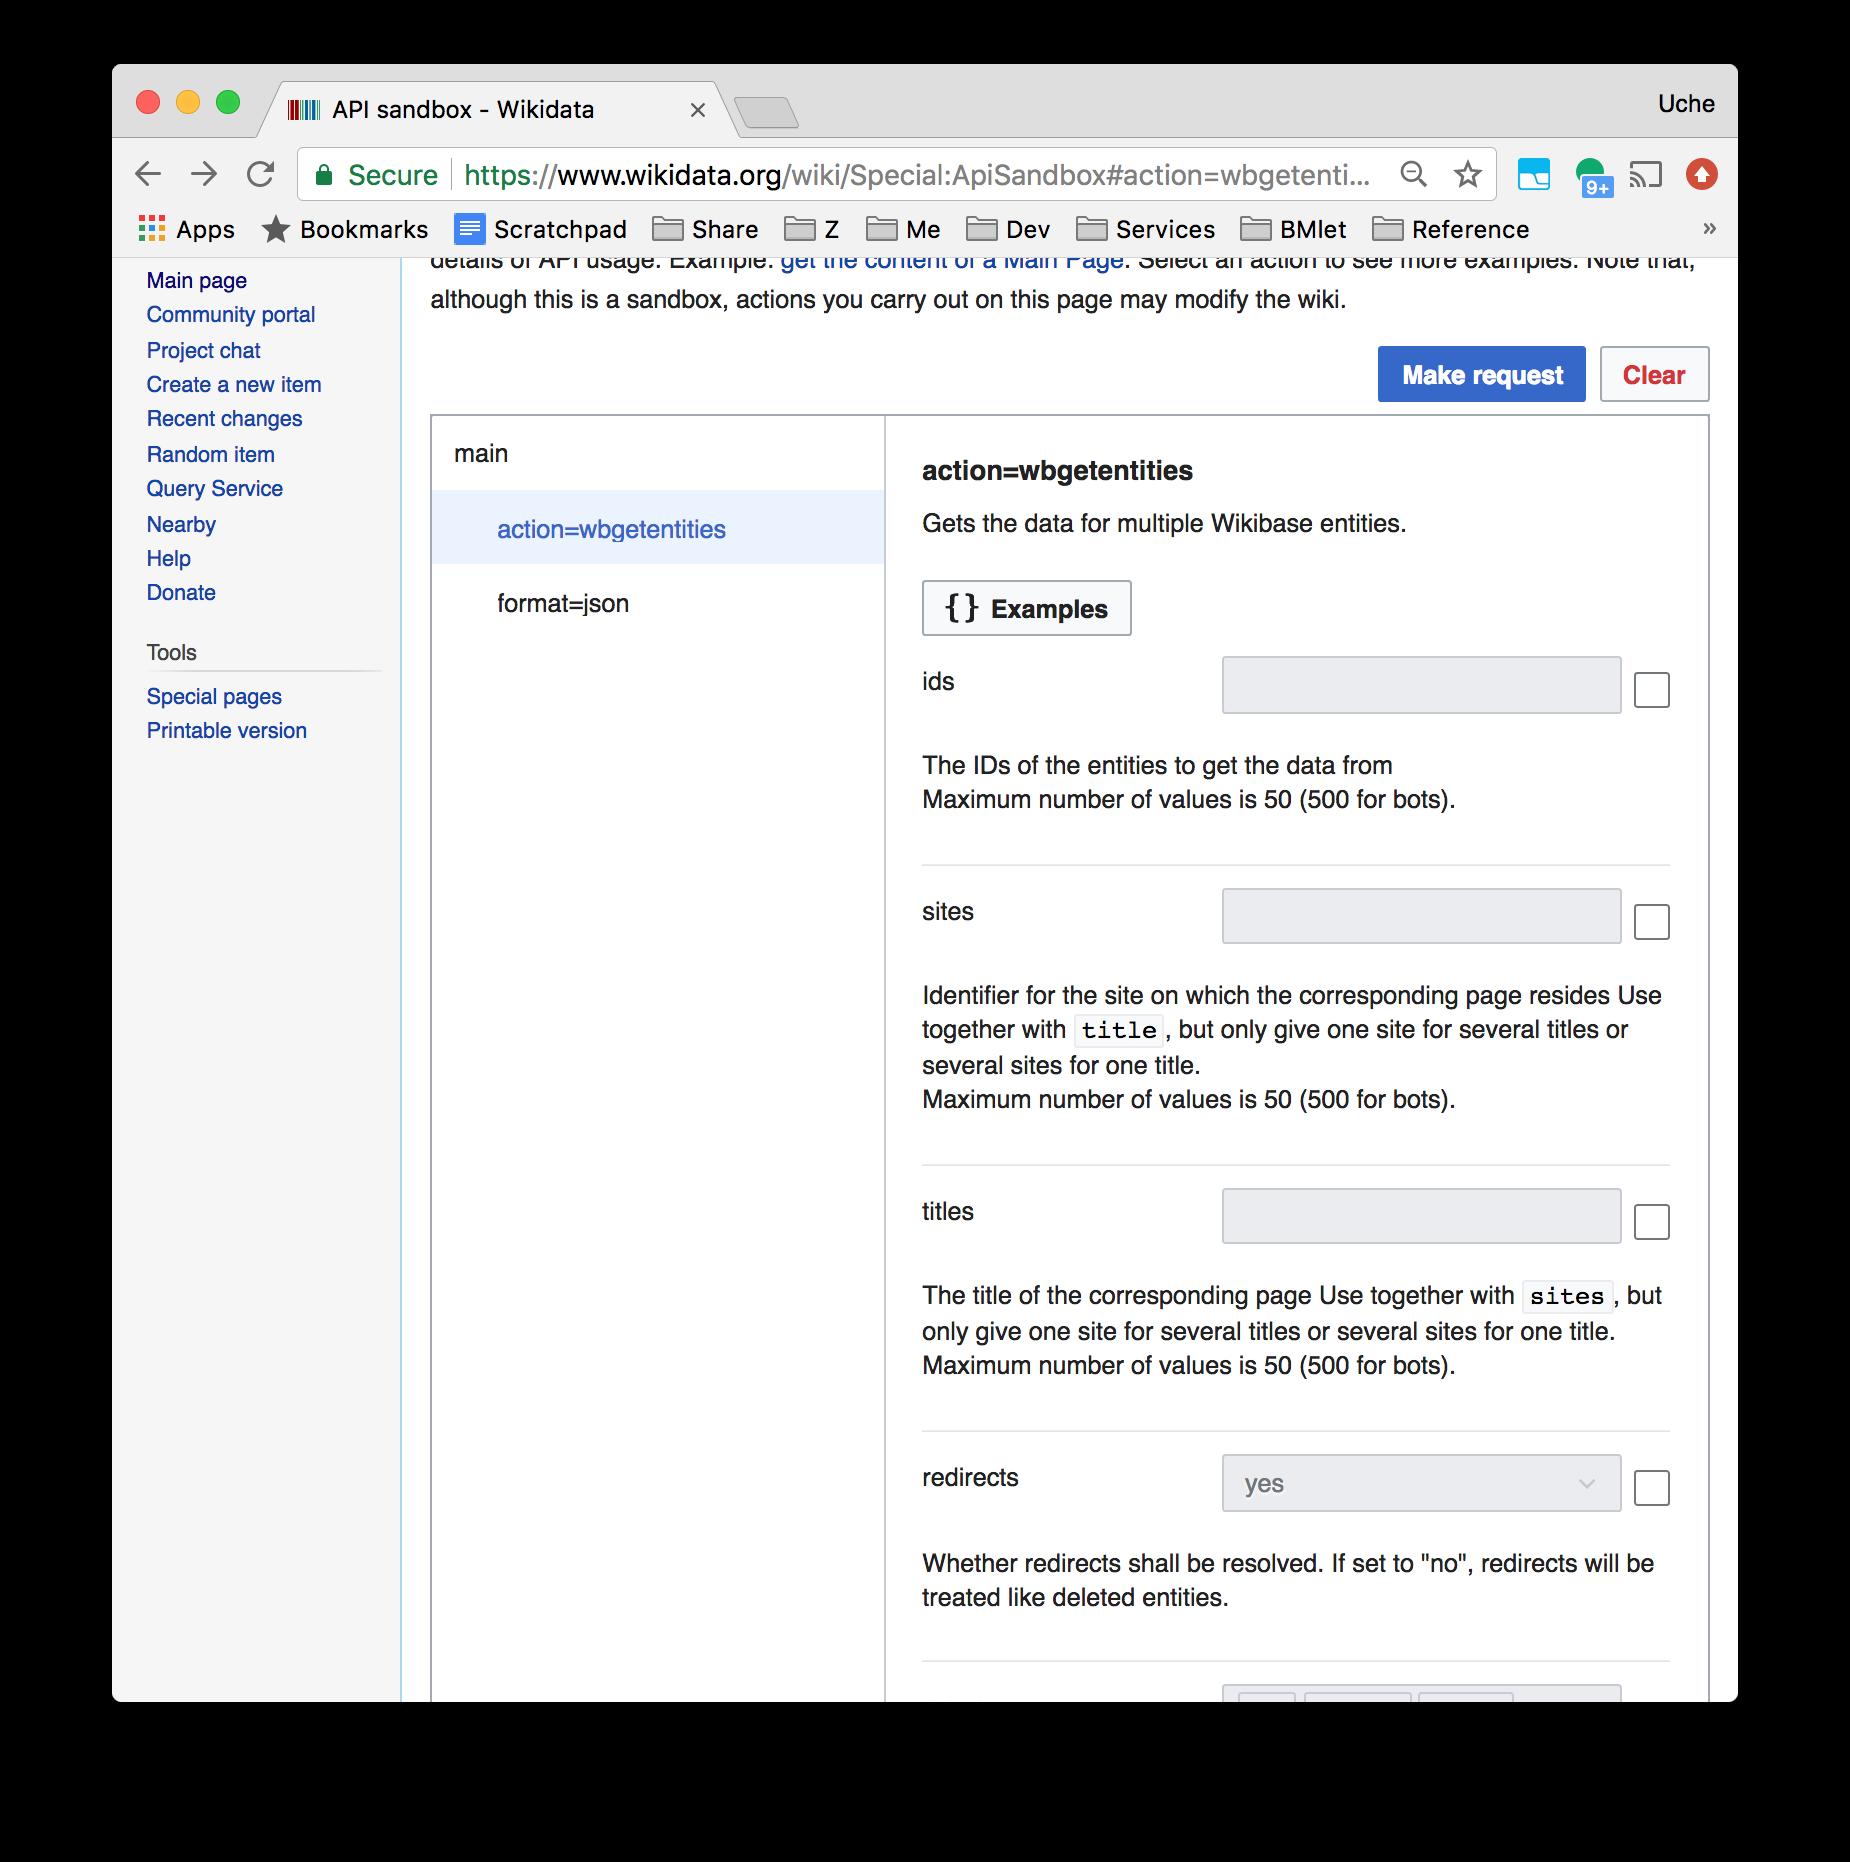 wikidata-api-sandbox2